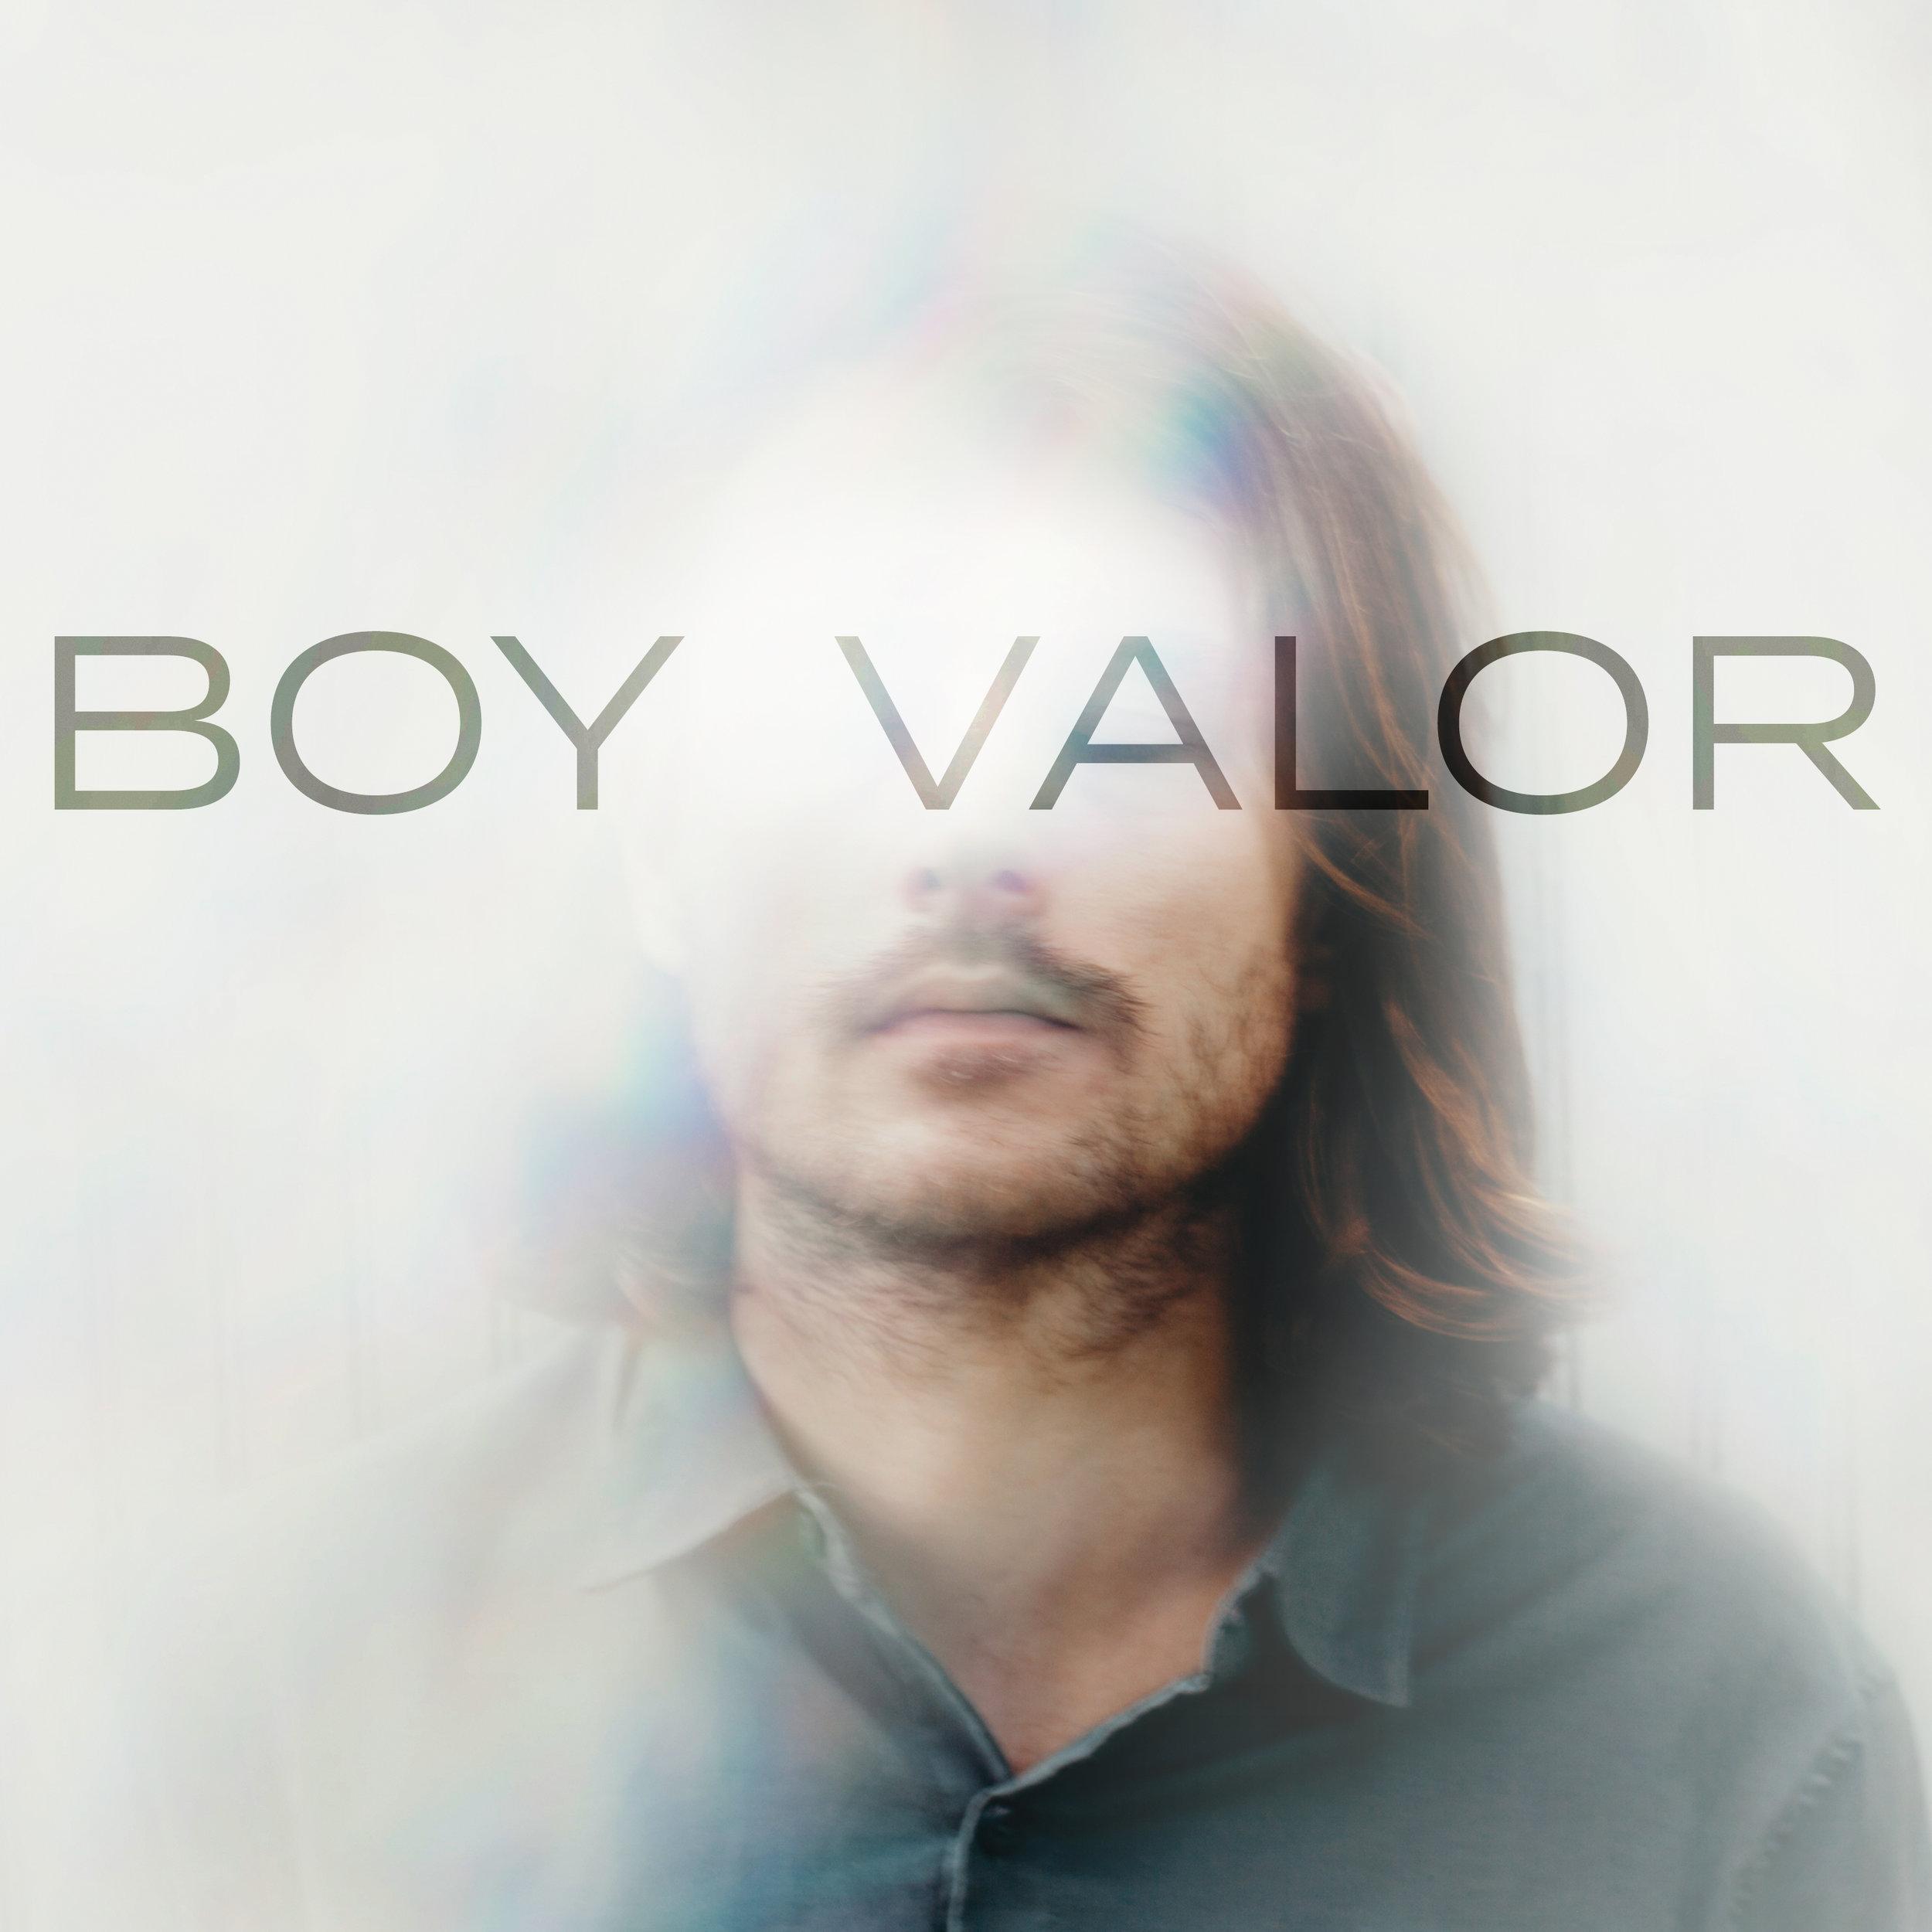 boy valor.jpg